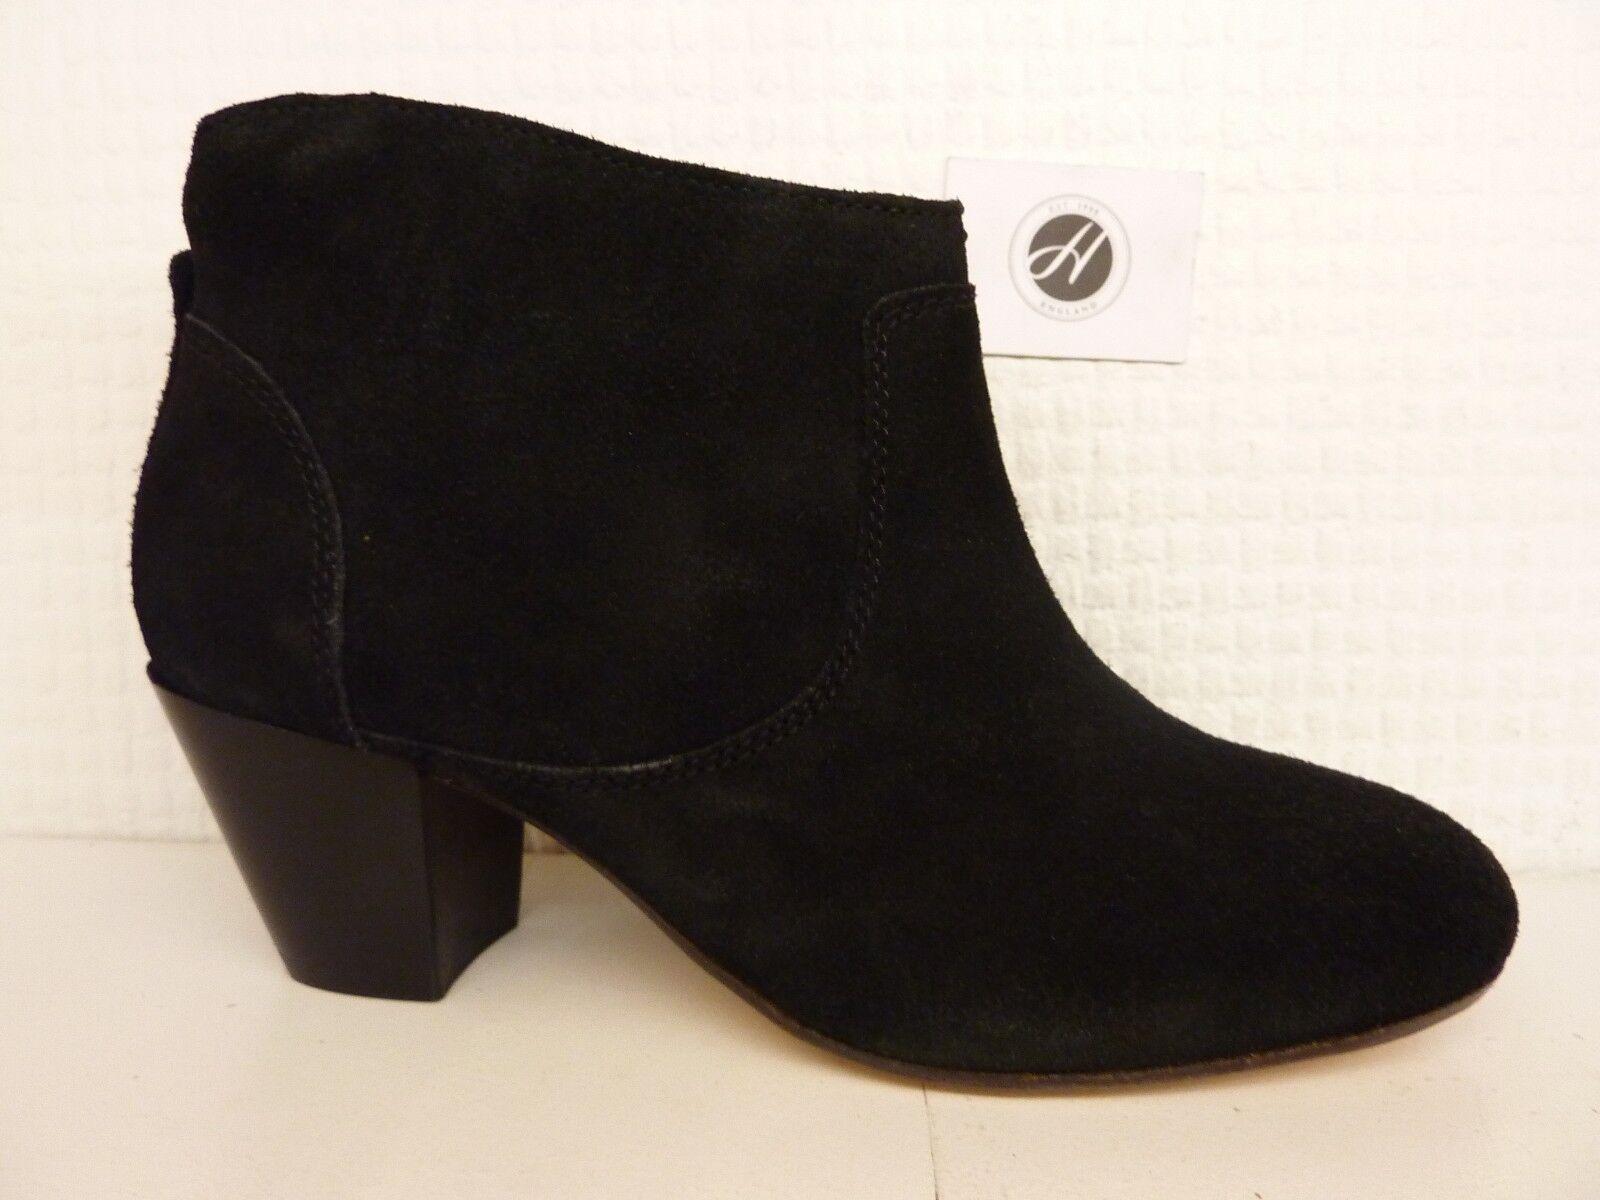 H by Hudson Kiver en Daim Noir Semelle En Cuir Talon Bottines Chaussures